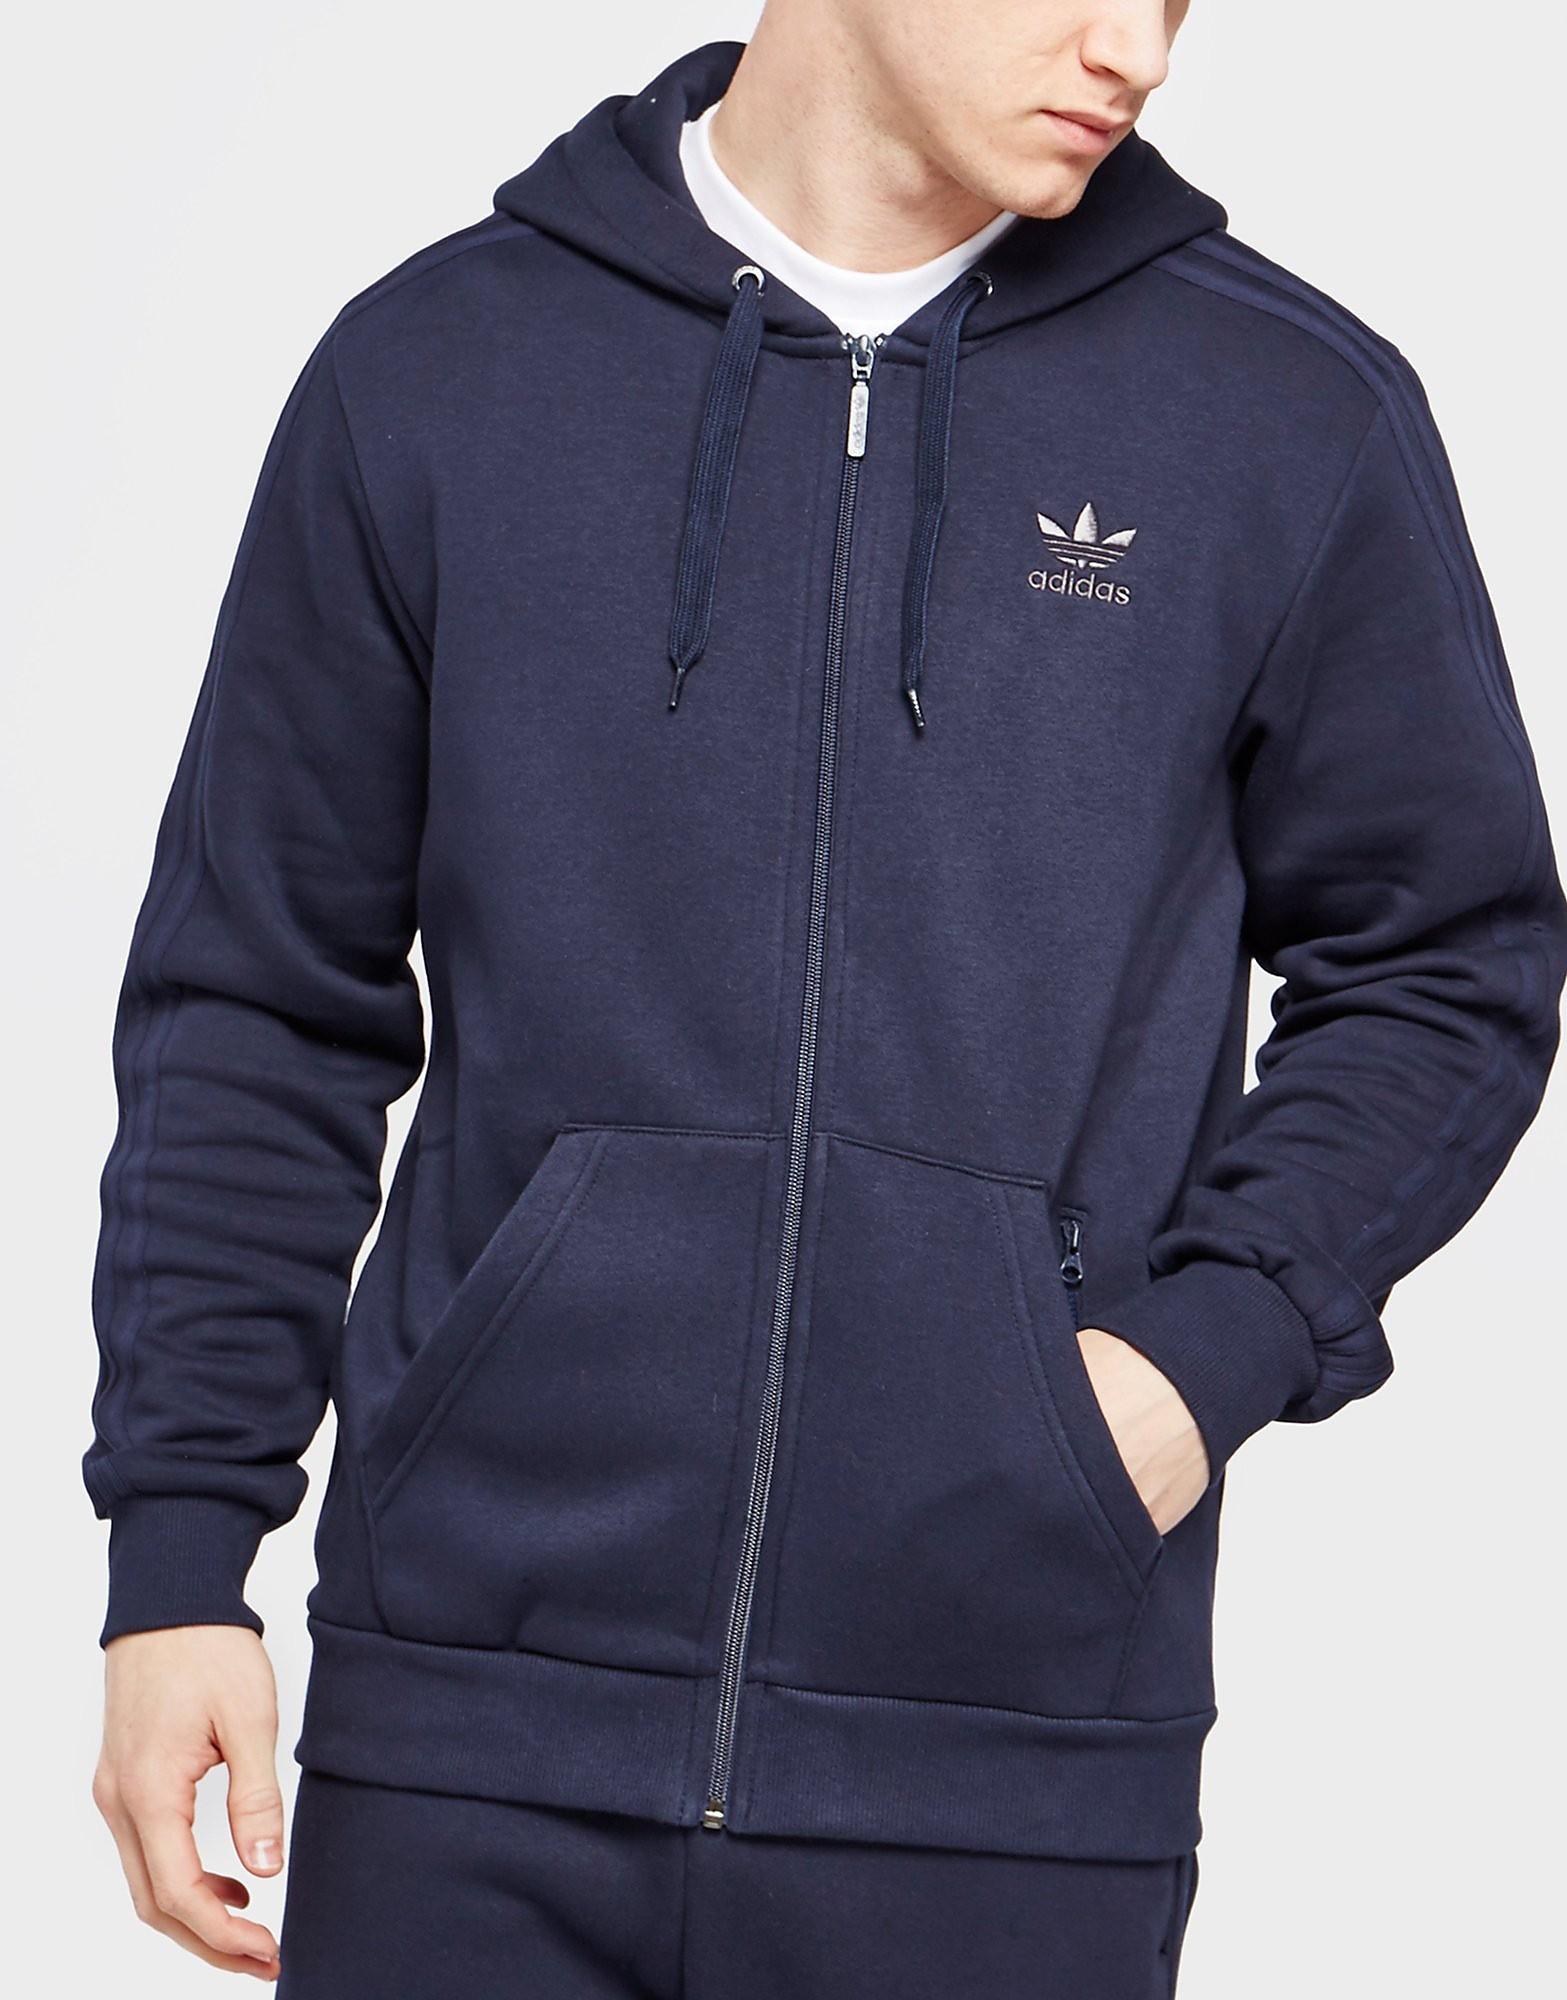 adidas Originals Superstar Full Zip Hoody